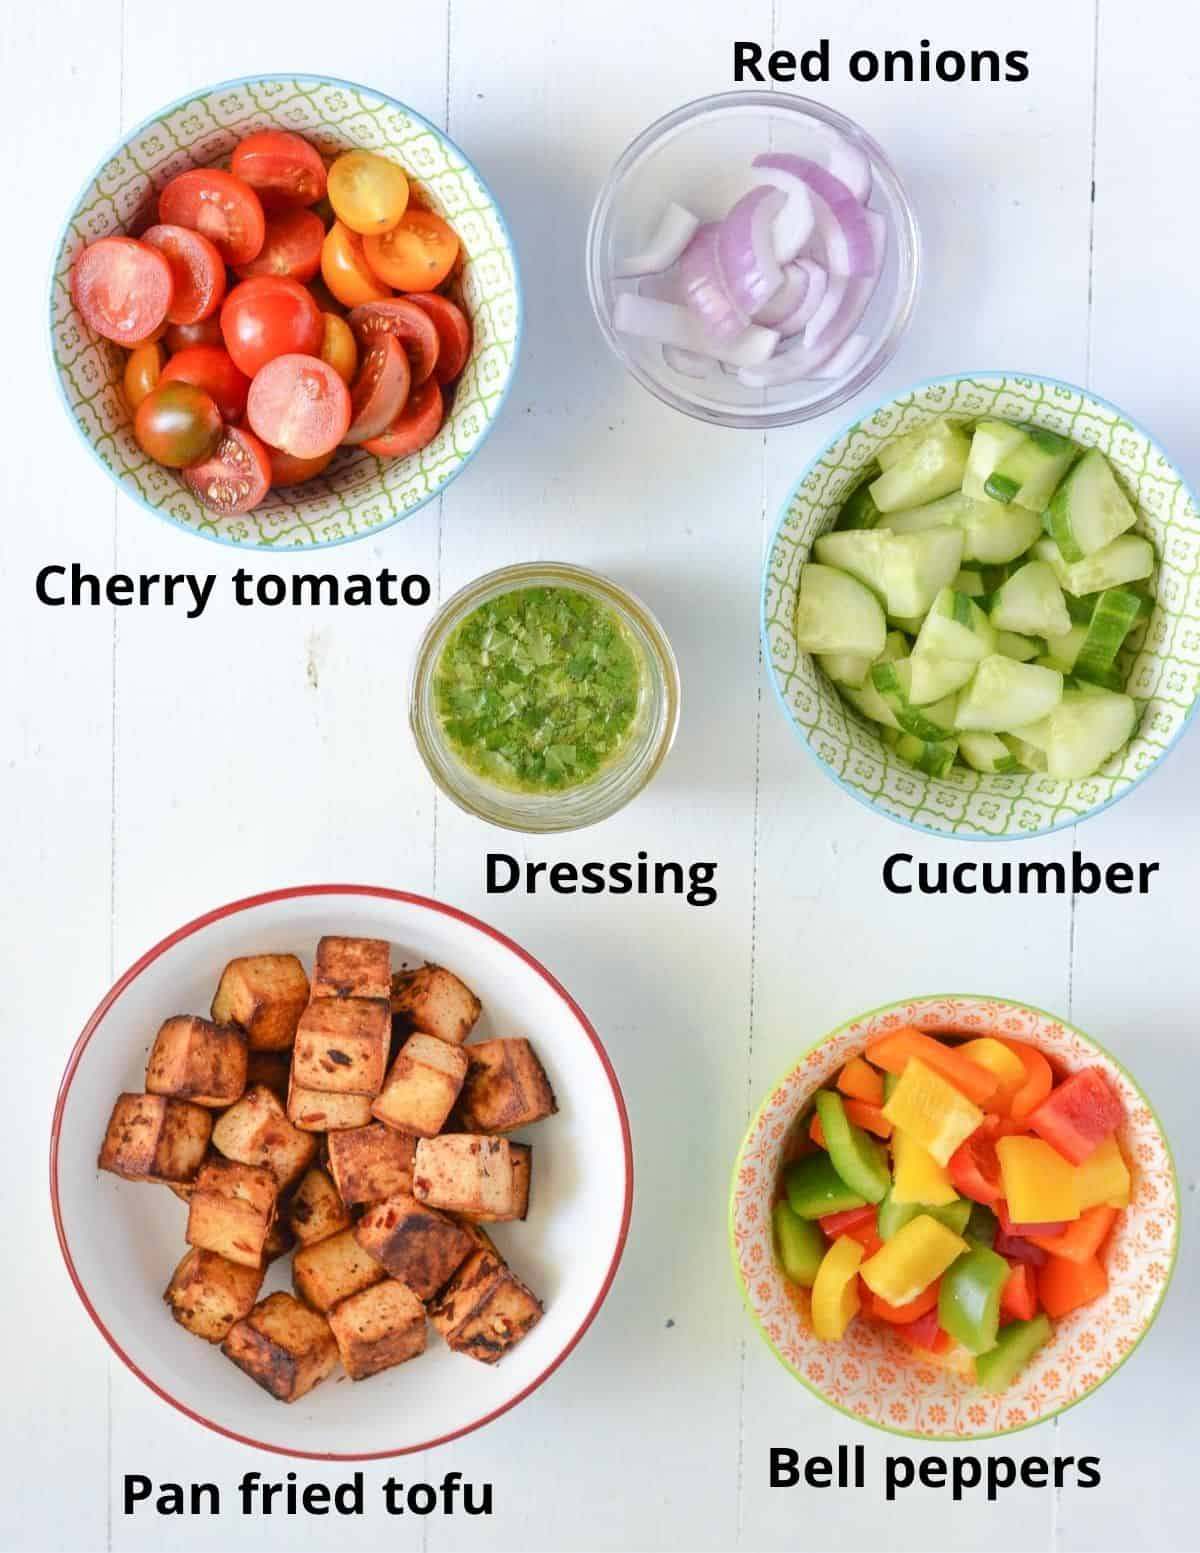 ingredients listed to make summer Panzanella salad.